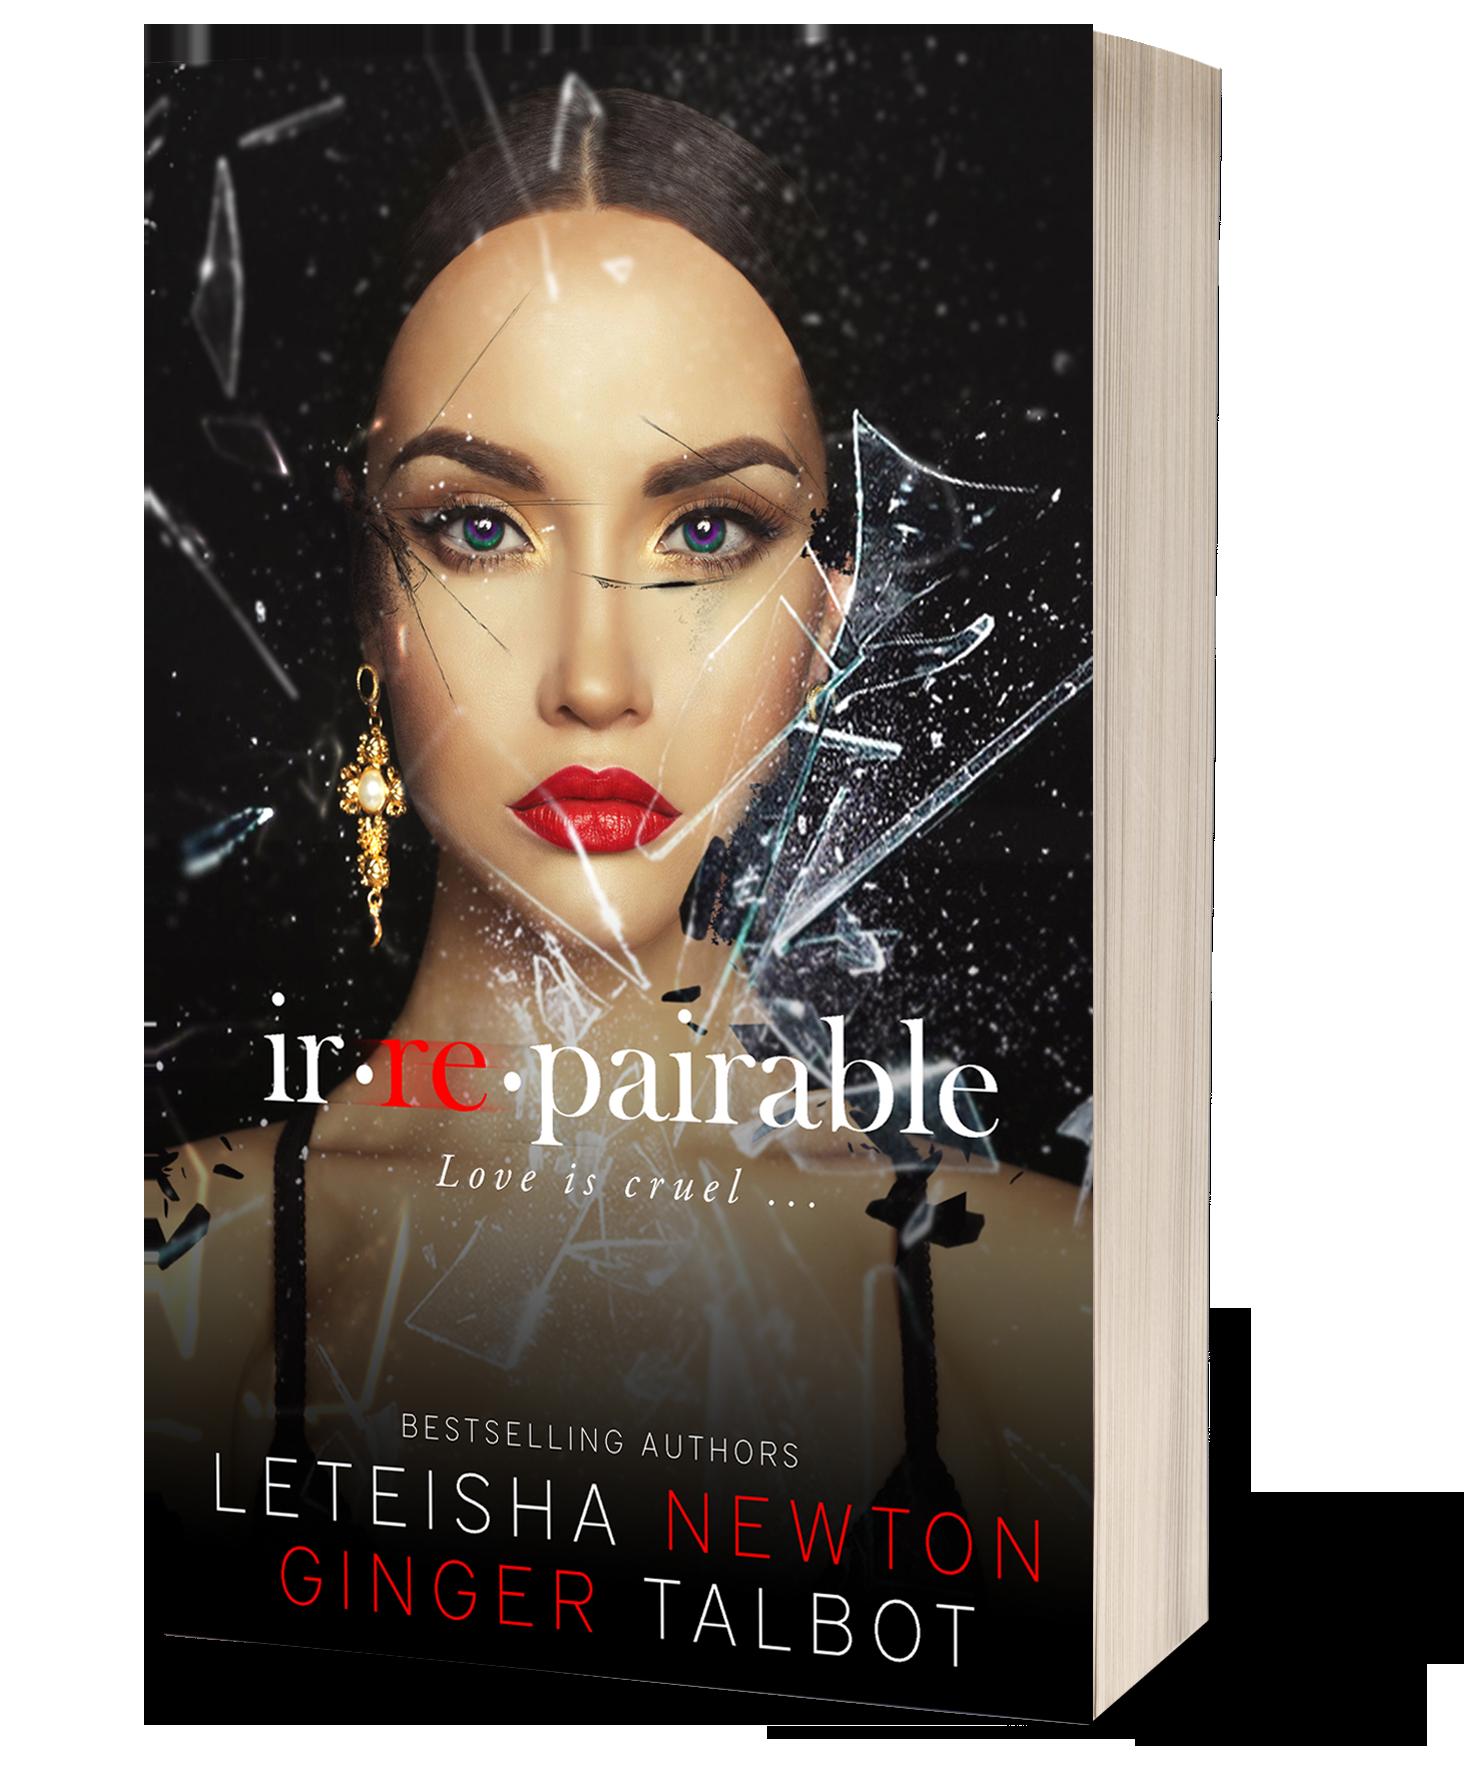 LeTeisha Newton - Irrepairable (Pinnacle Heirs Book 1) cover